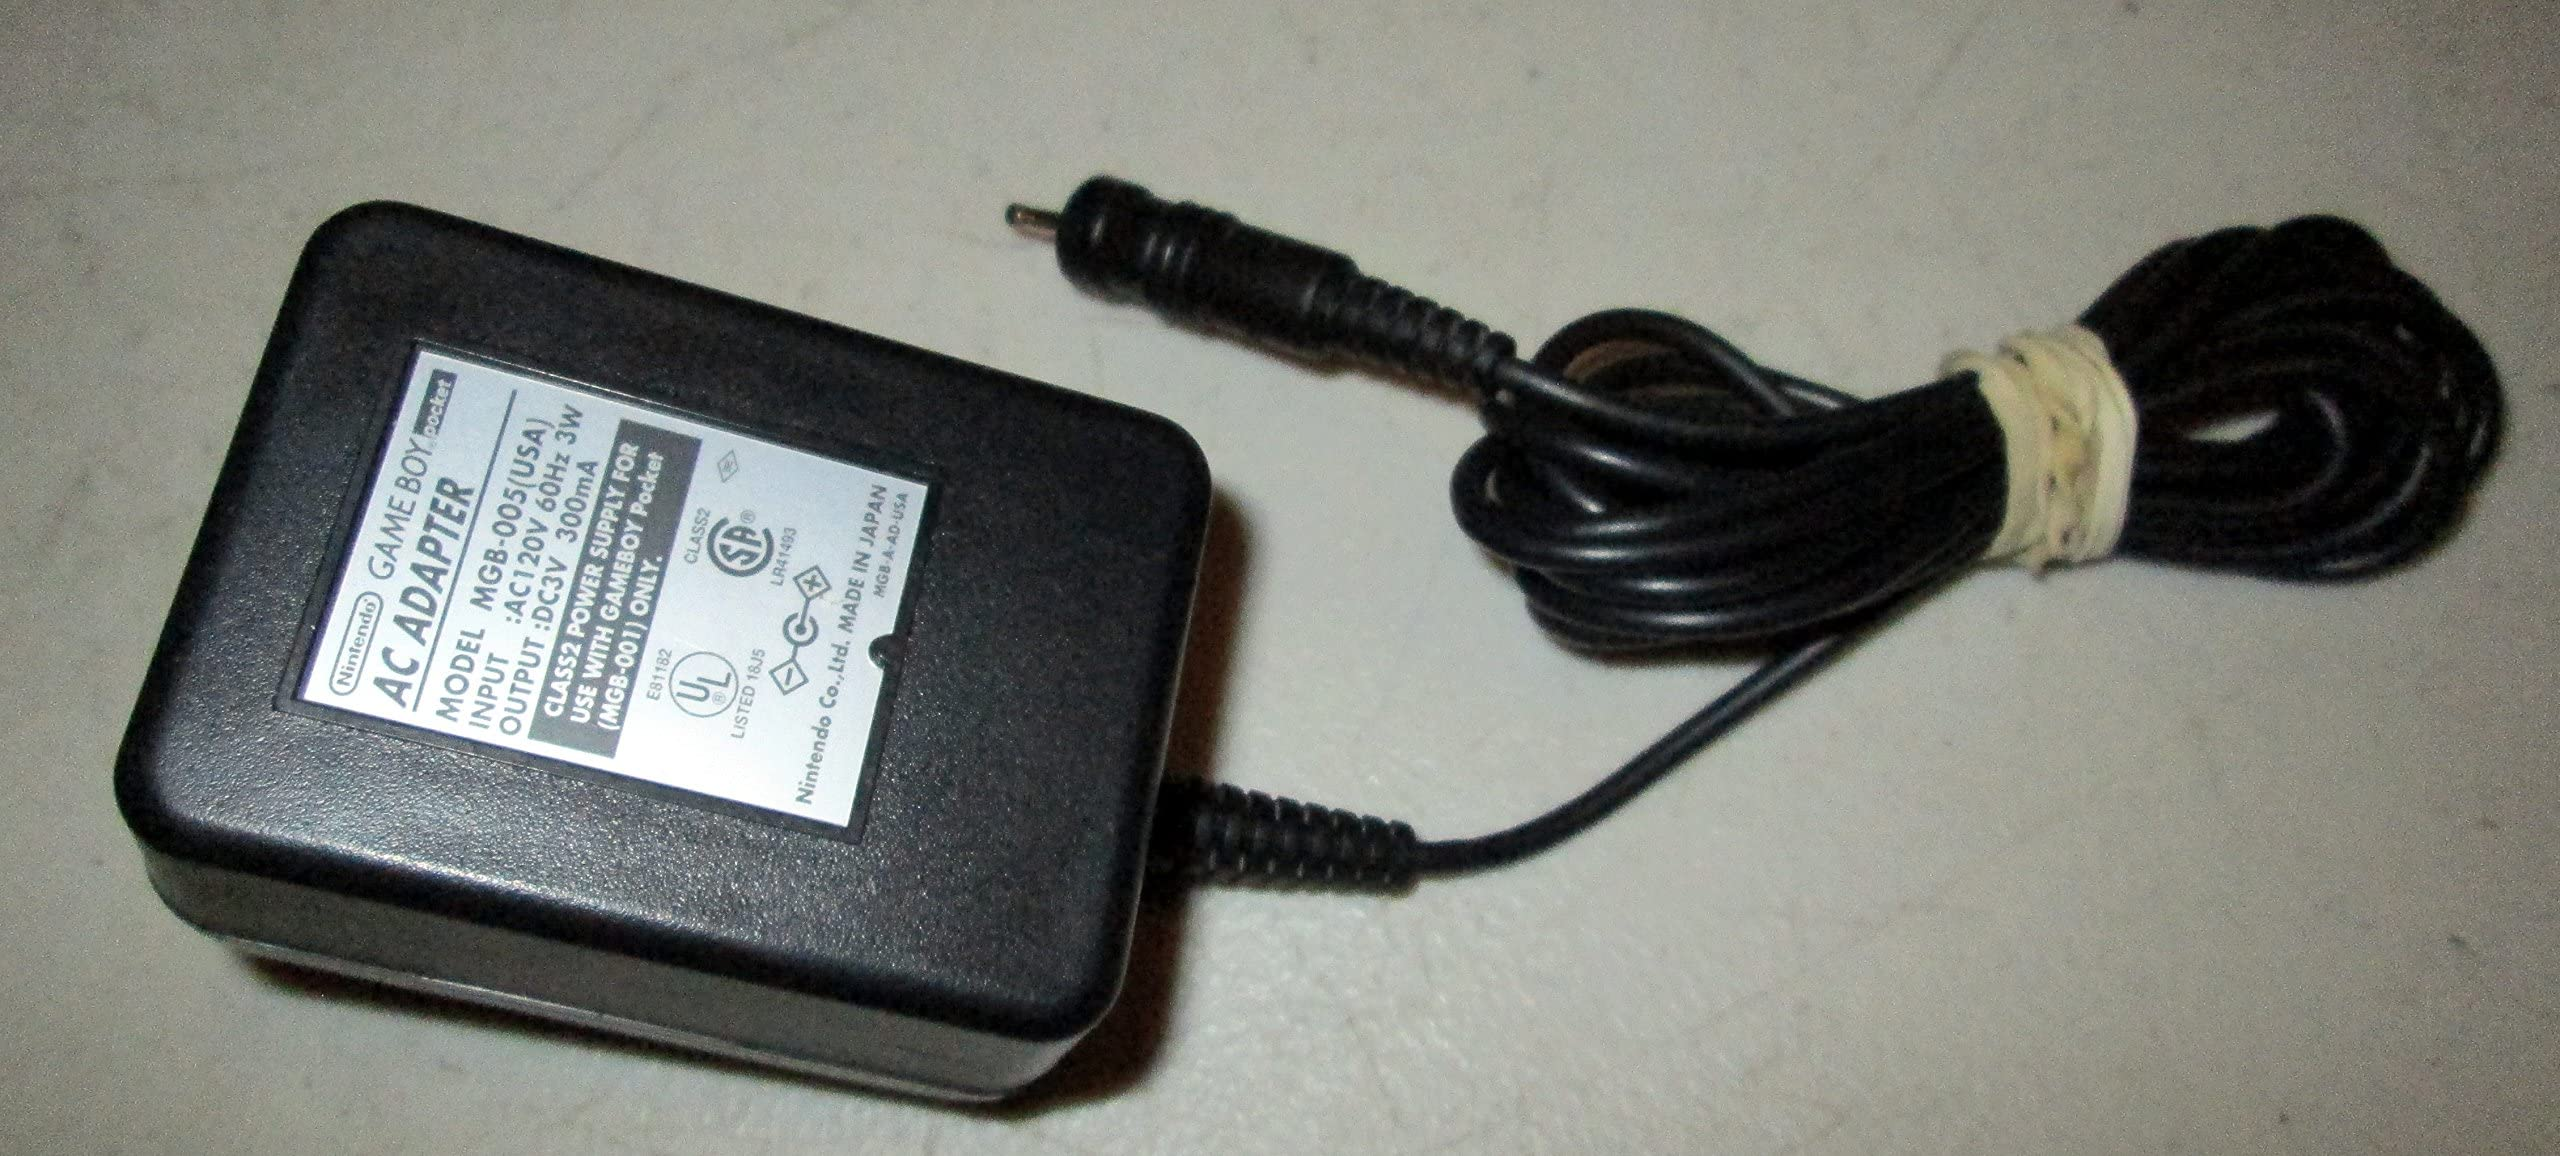 Amazon com: Nintendo Game Boy Color and Pocket AC Adapter